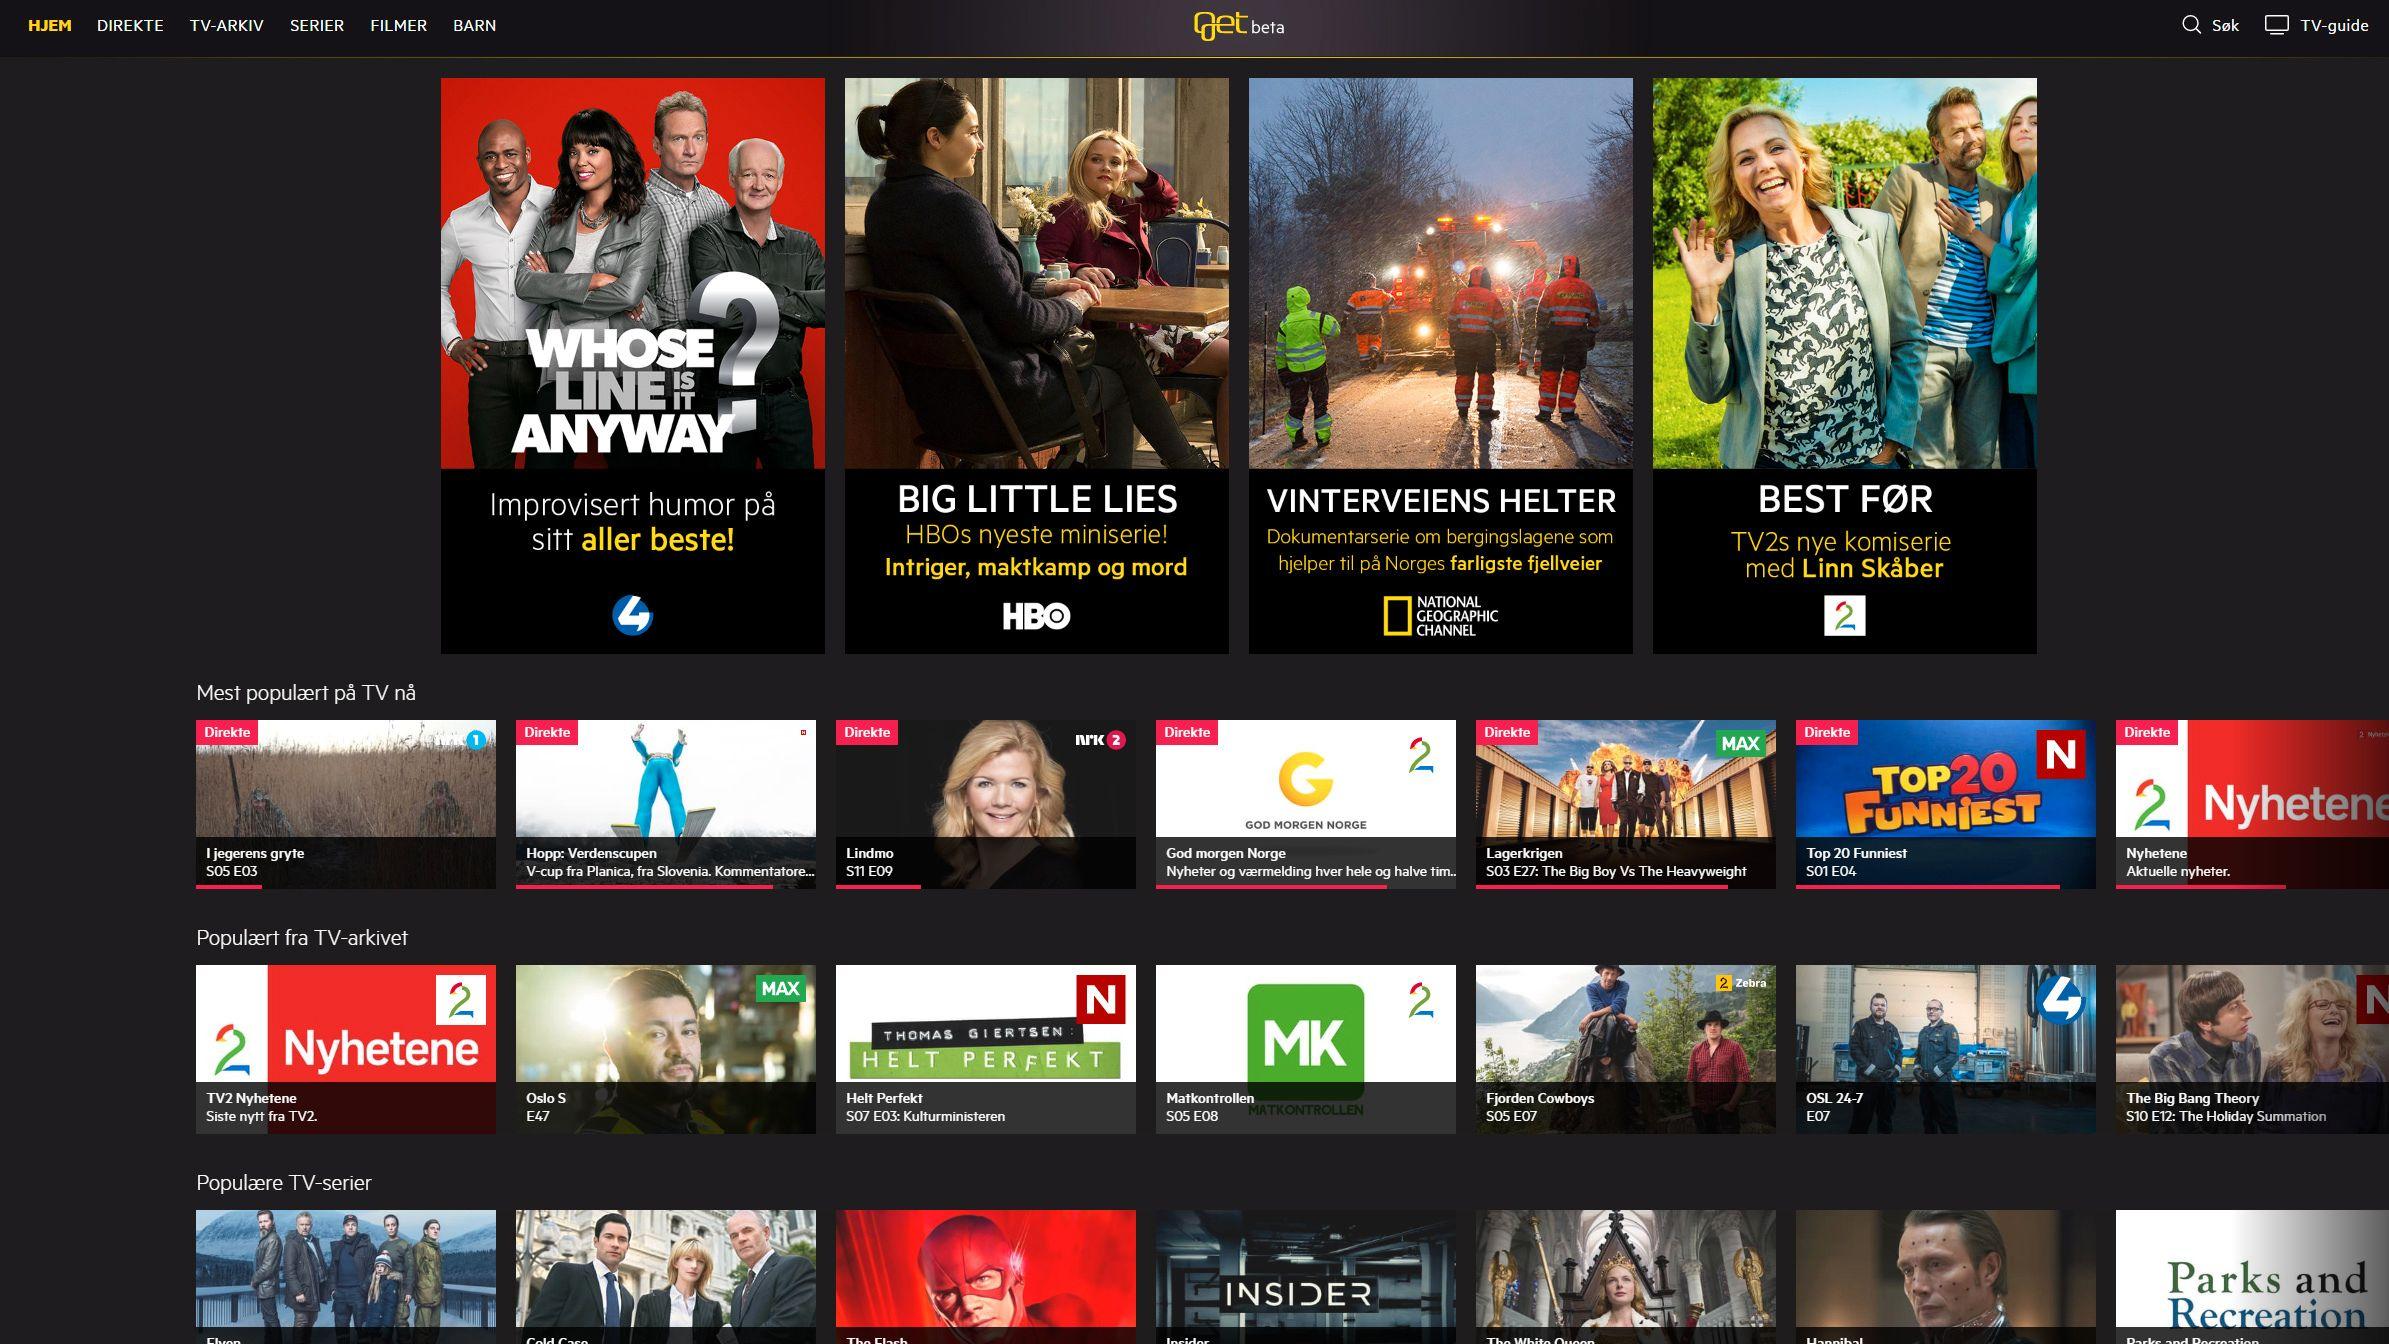 Get web-TV